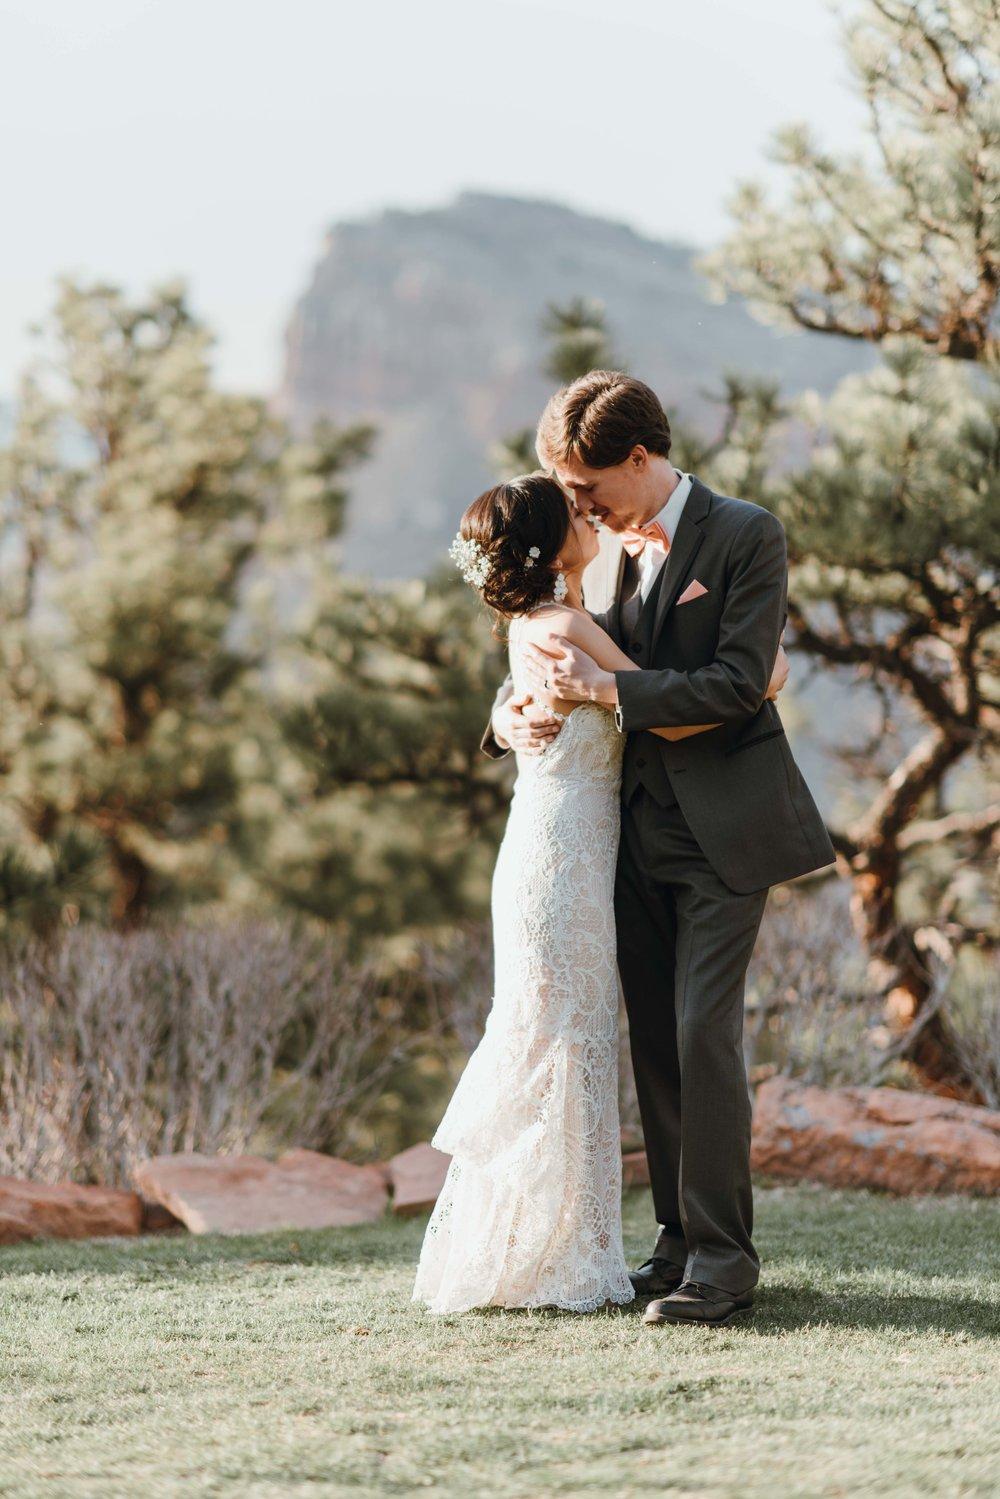 denver wedding photographer lioncrest manor in lyons ben and mali -DSC_1994.jpg